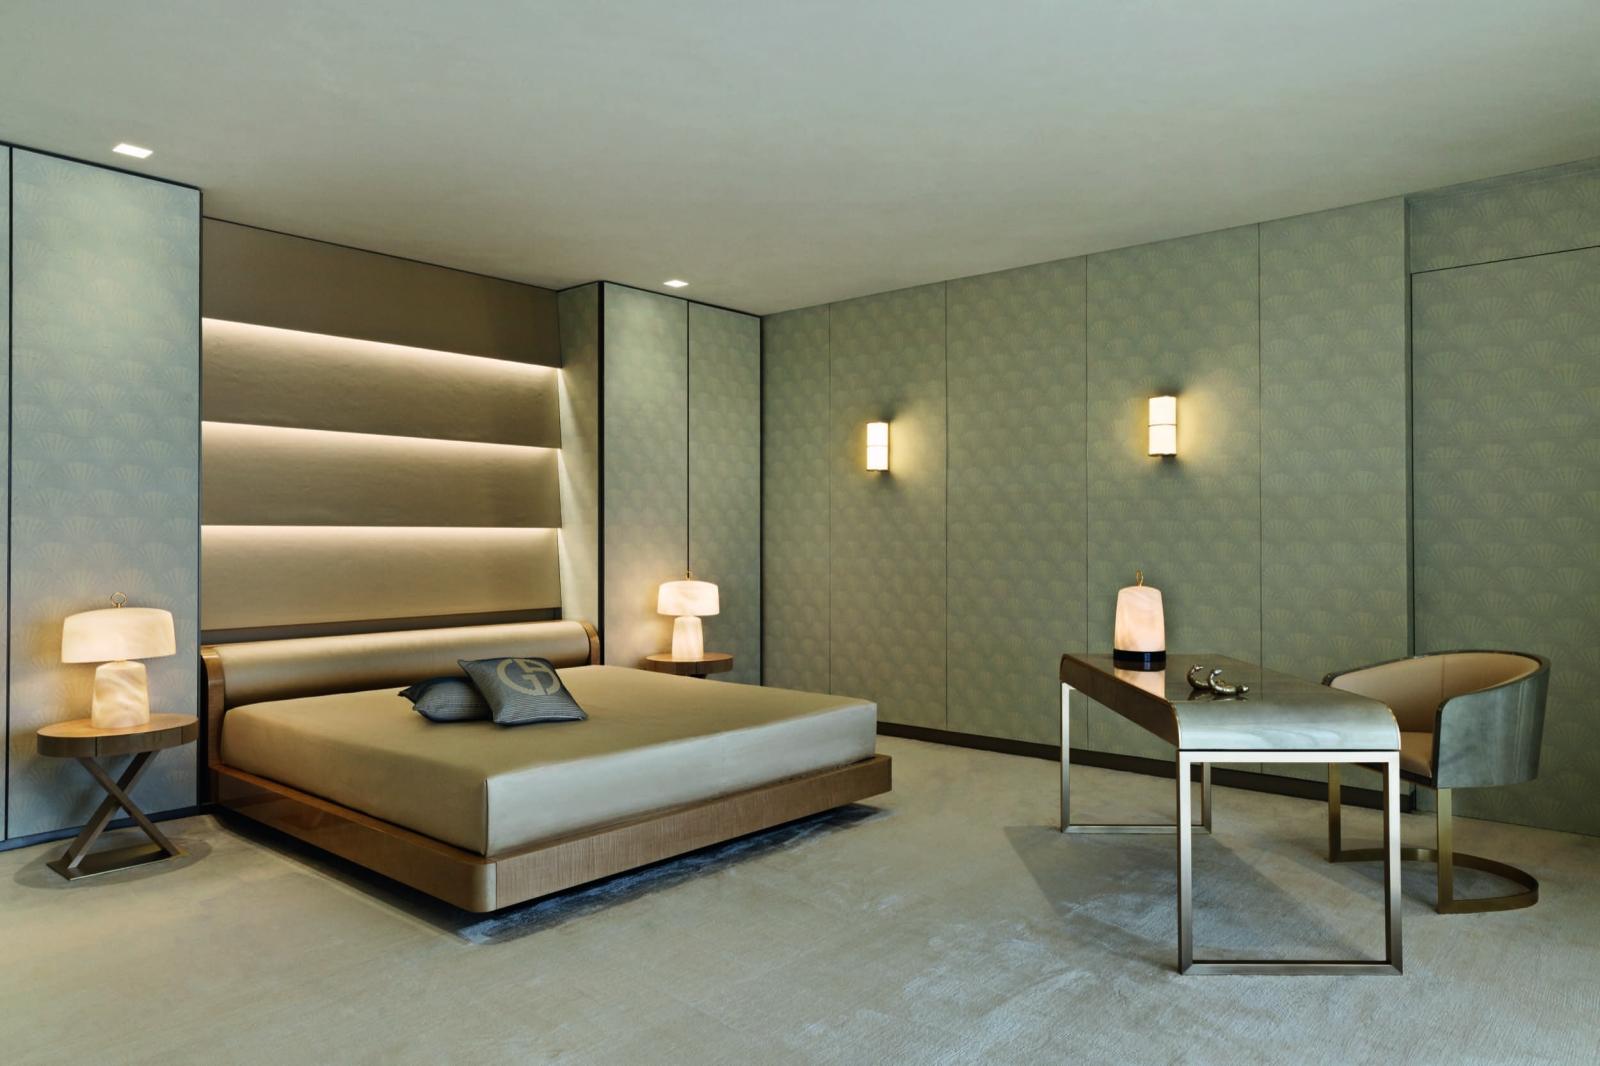 inside-residences-armani-casa-model-unit_1.jpg